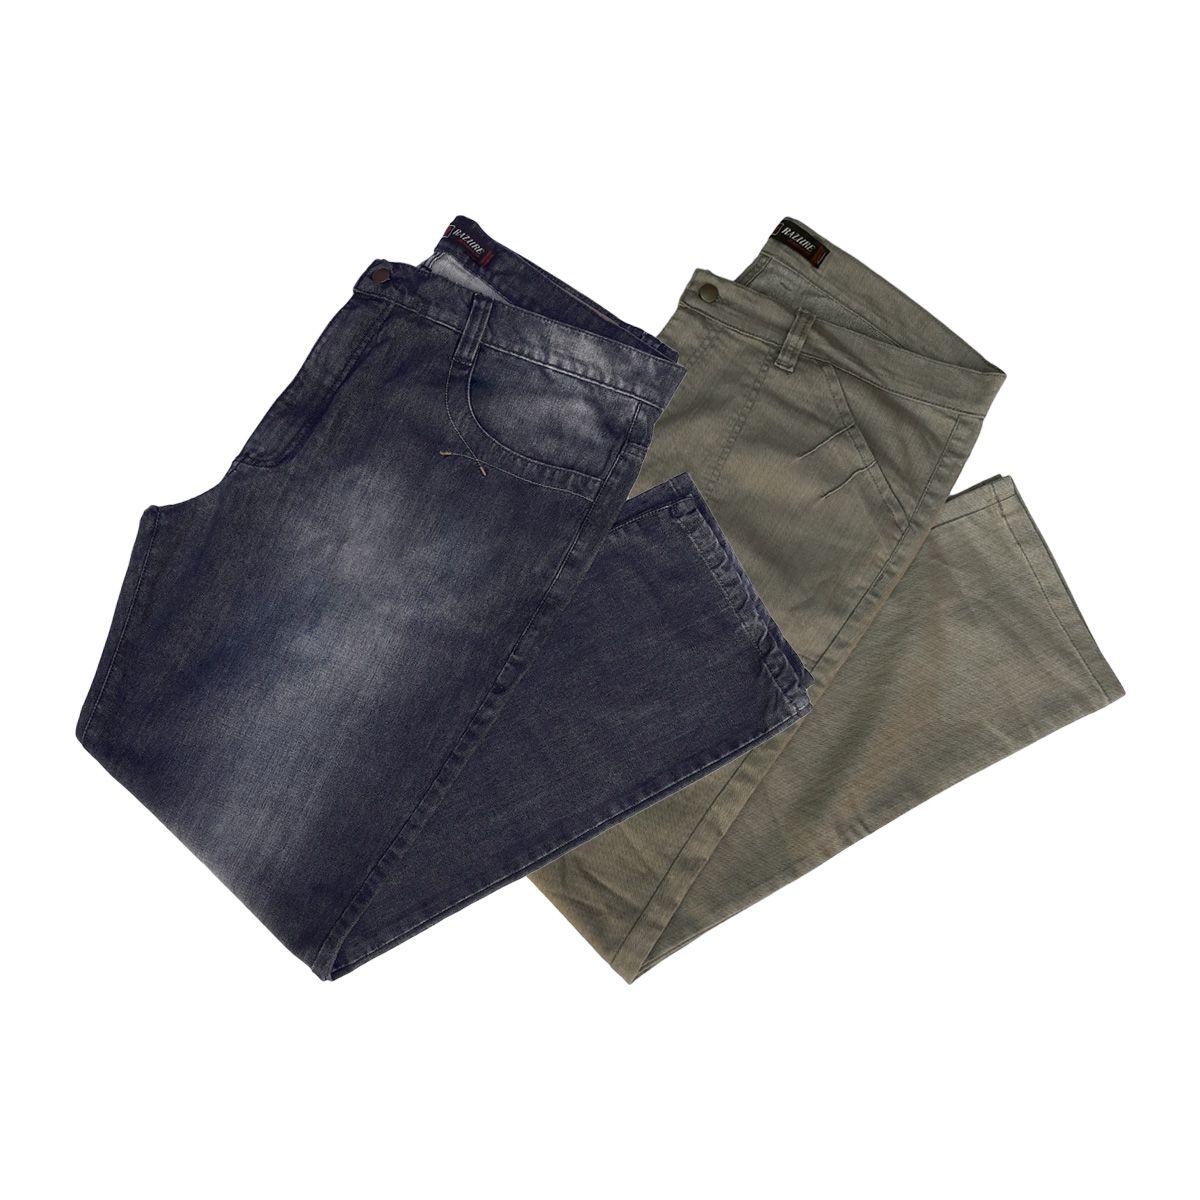 Kit C/ 02 Calças Jeans Masculinas Plus Size Tamanho 56